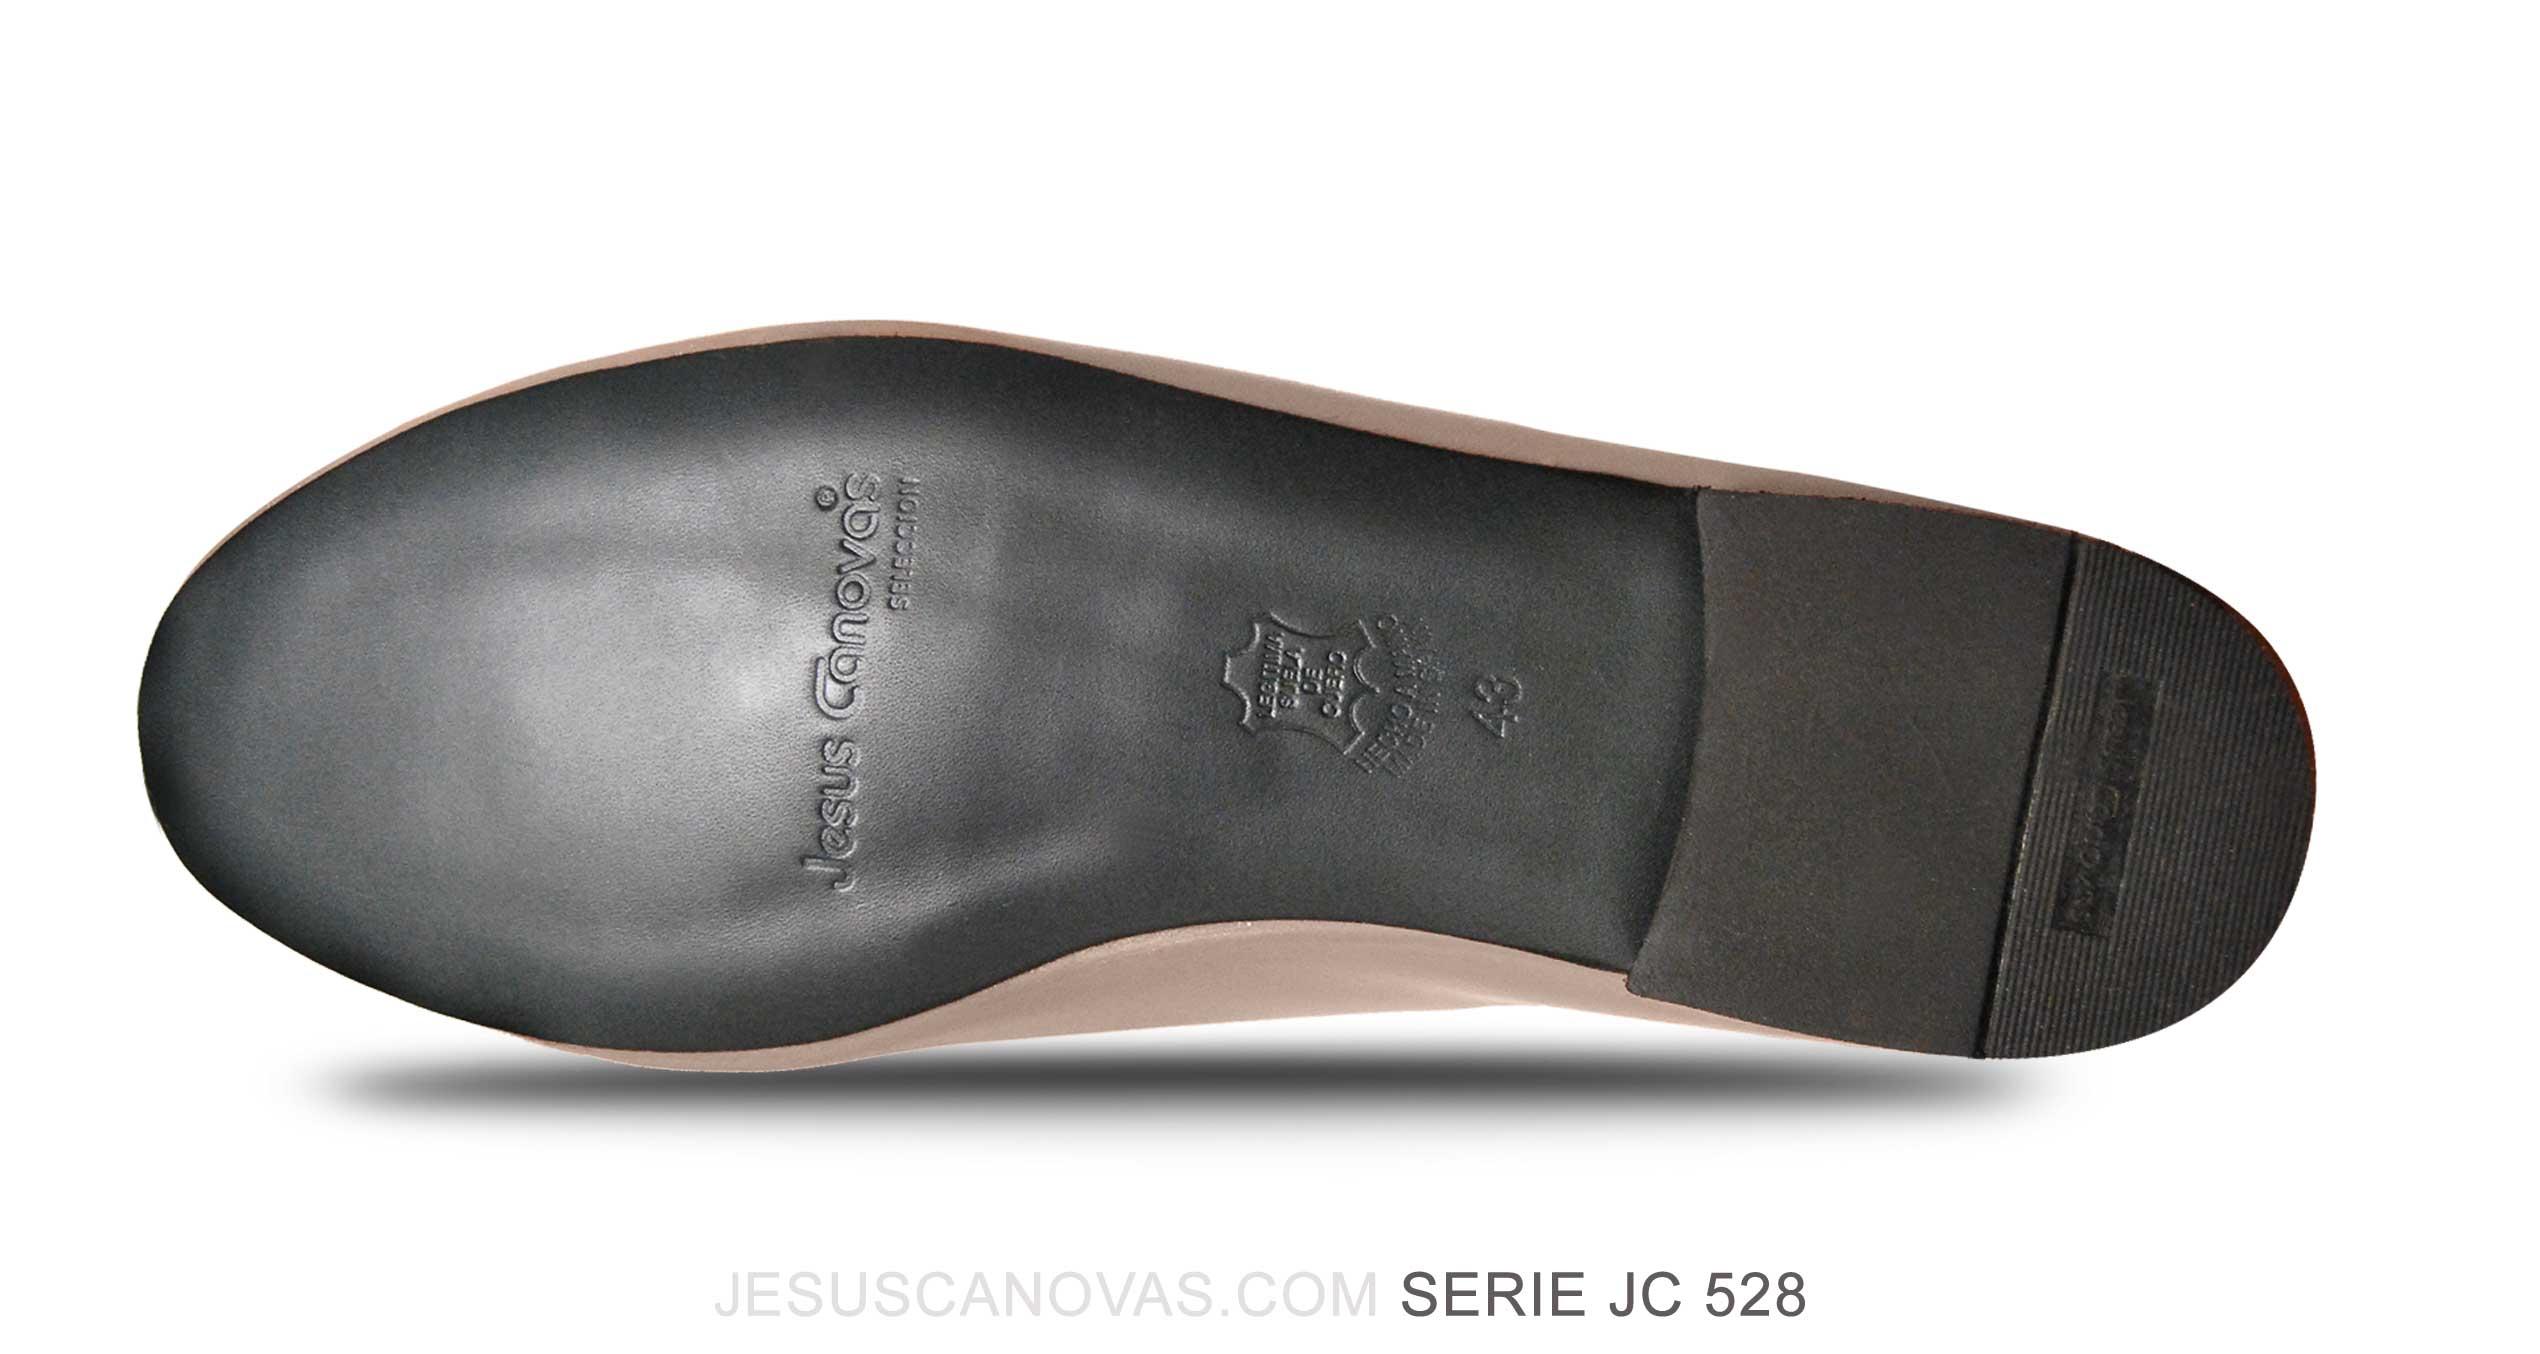 Foto 3 de Zapatos Julio Iglesias 528 JC Taupe Piel Napa